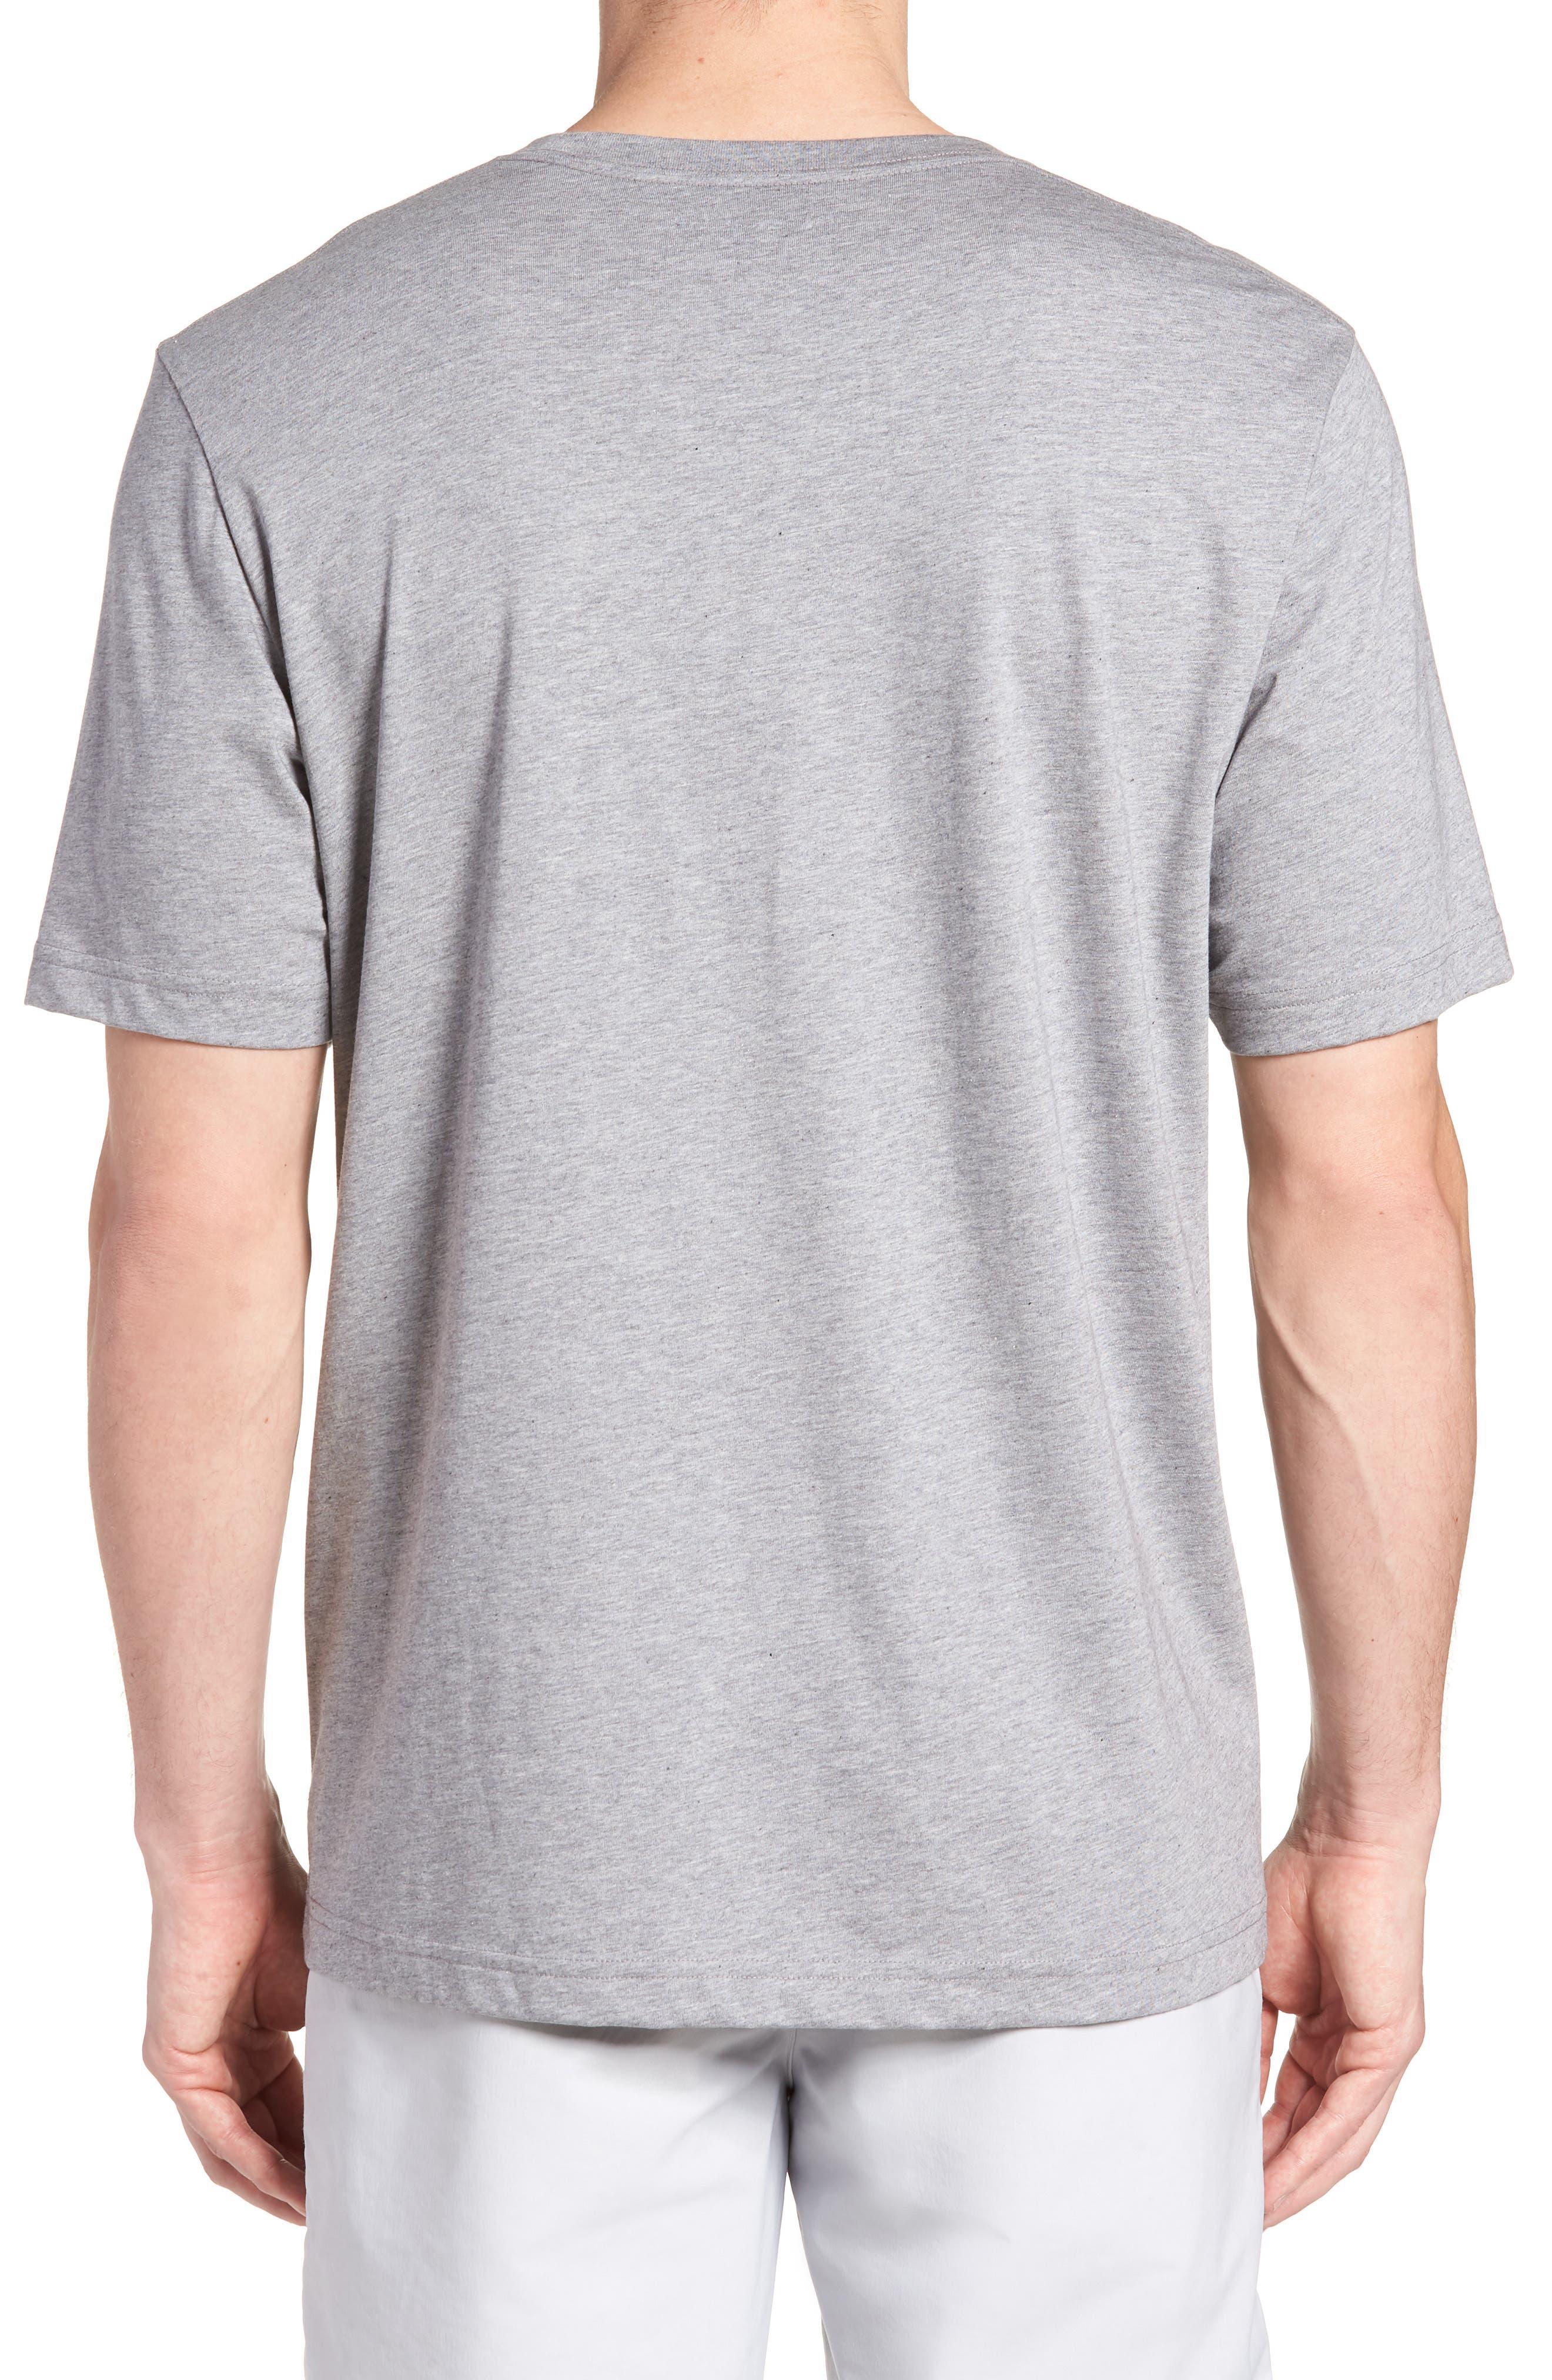 'Mapes' Graphic Pima Cotton T-Shirt,                             Alternate thumbnail 2, color,                             020